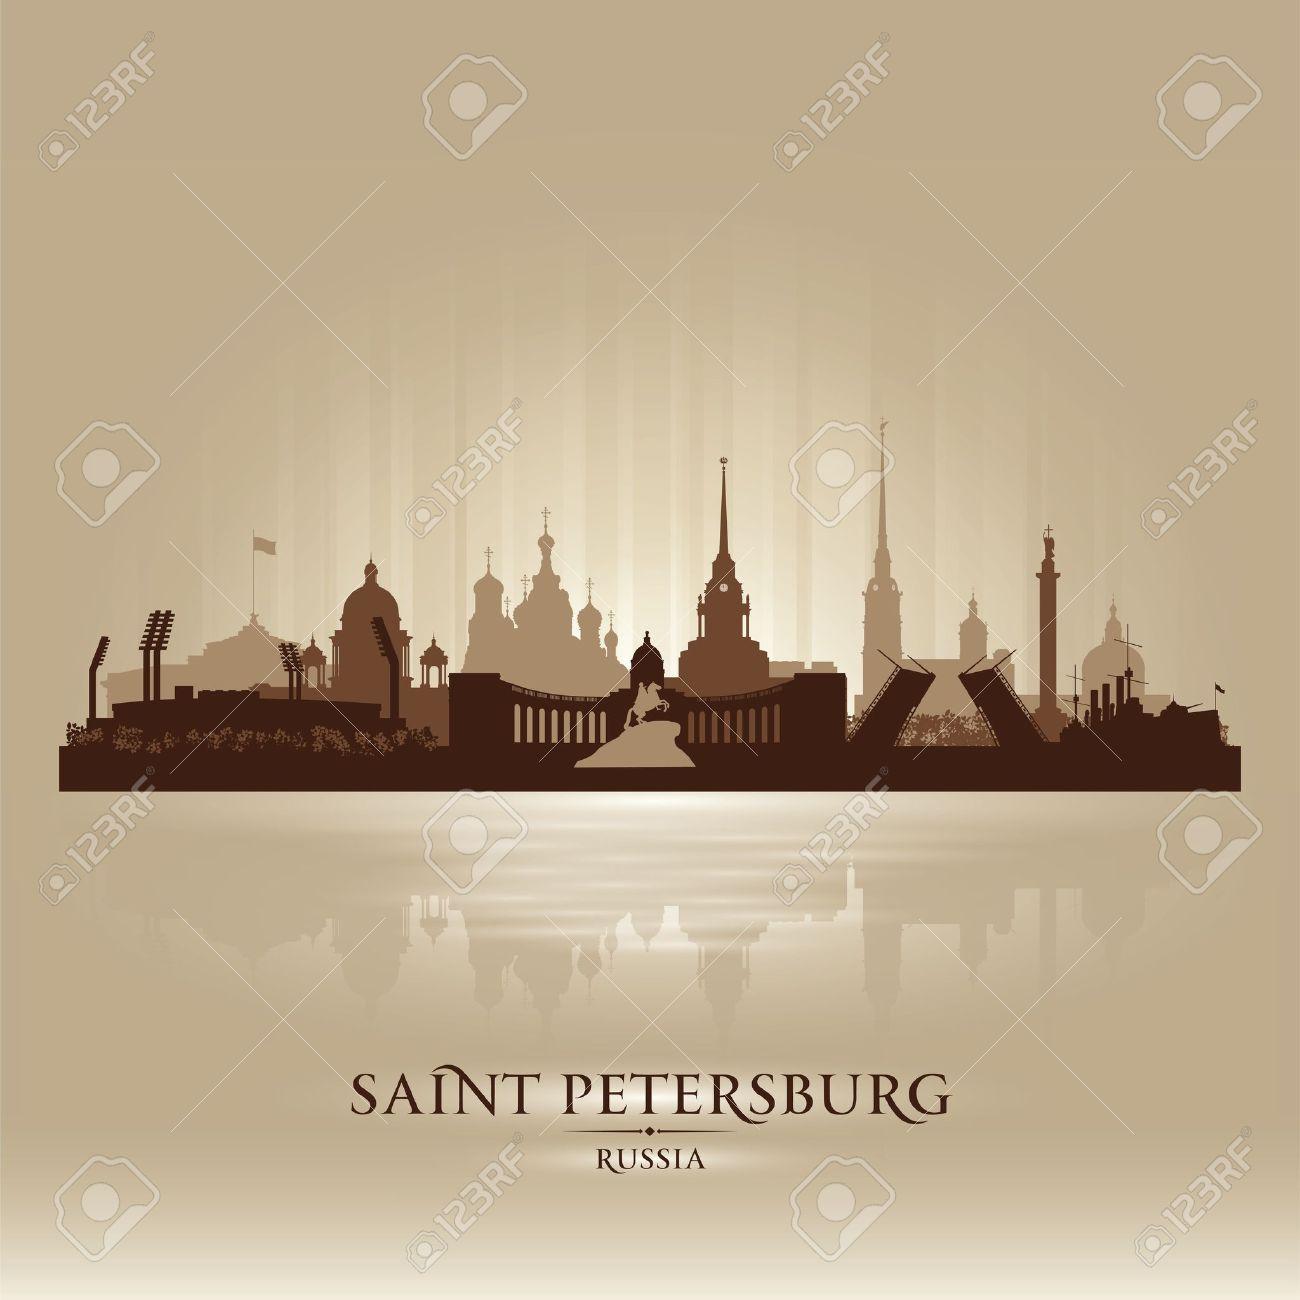 Saint Petersburg Russia City Skyline Silhouette. Royalty Free.